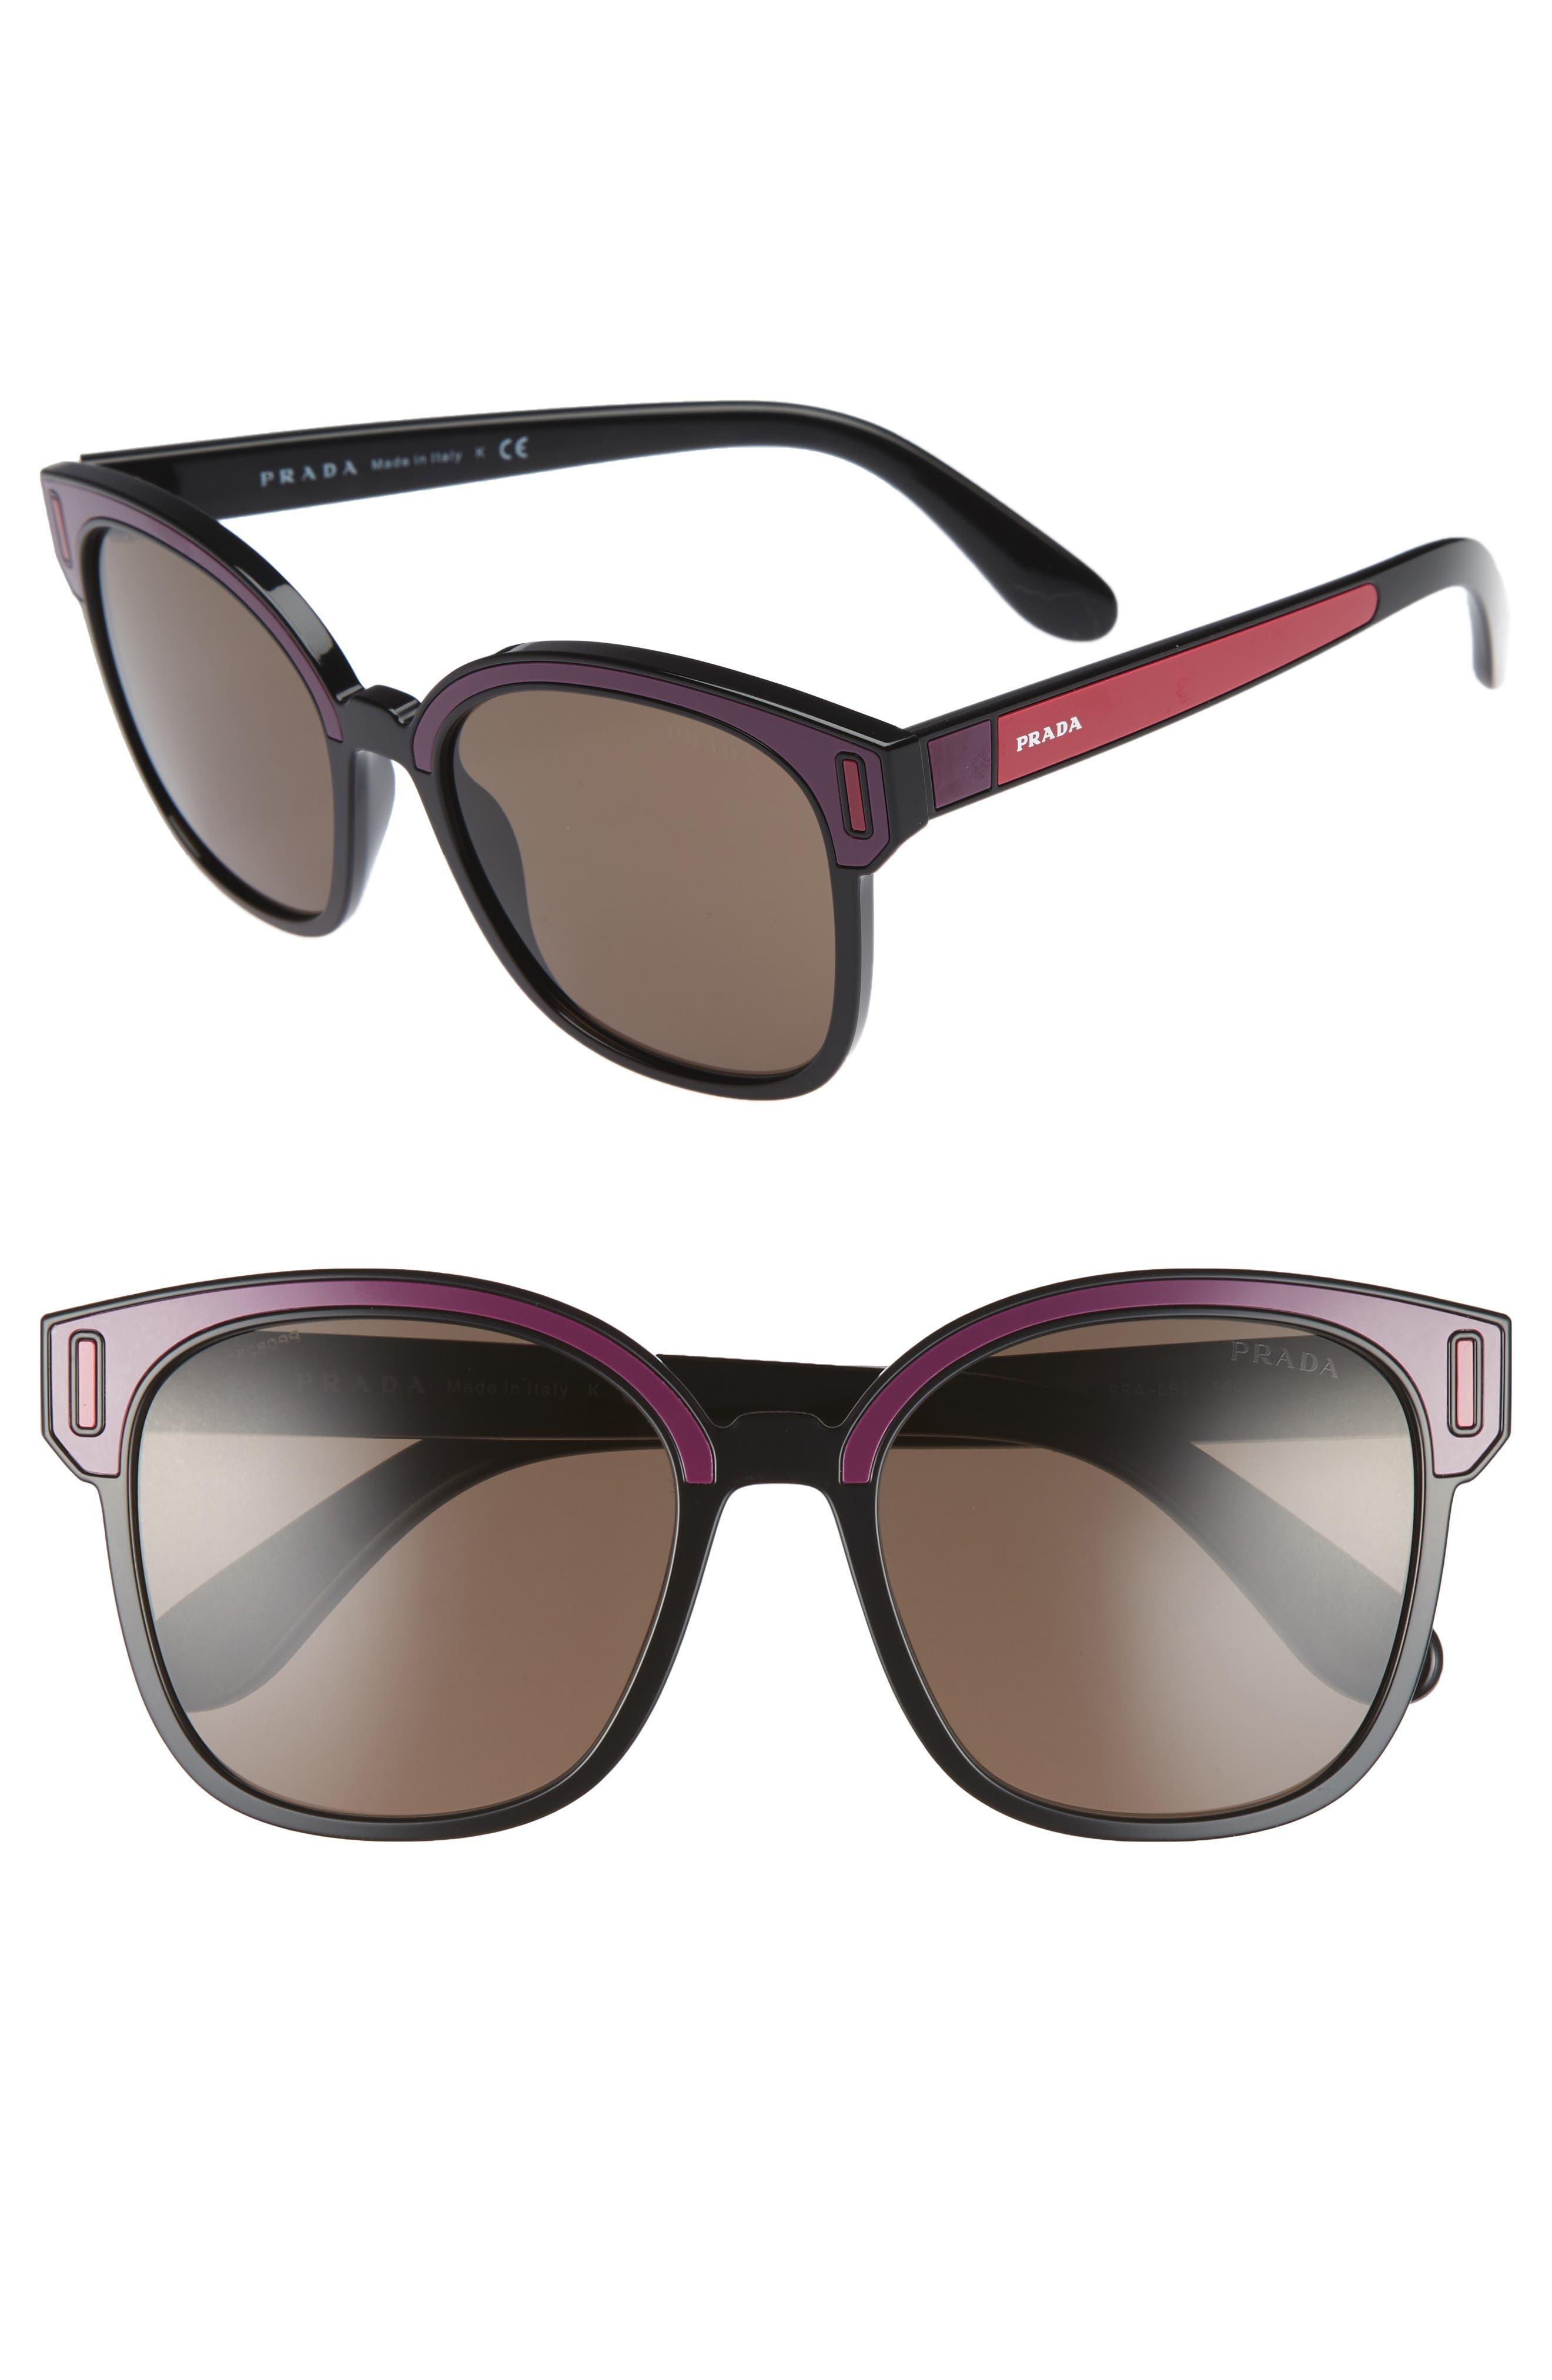 Alternate Image 1 Selected - Prada 53mm Colorblock Square Sunglasses